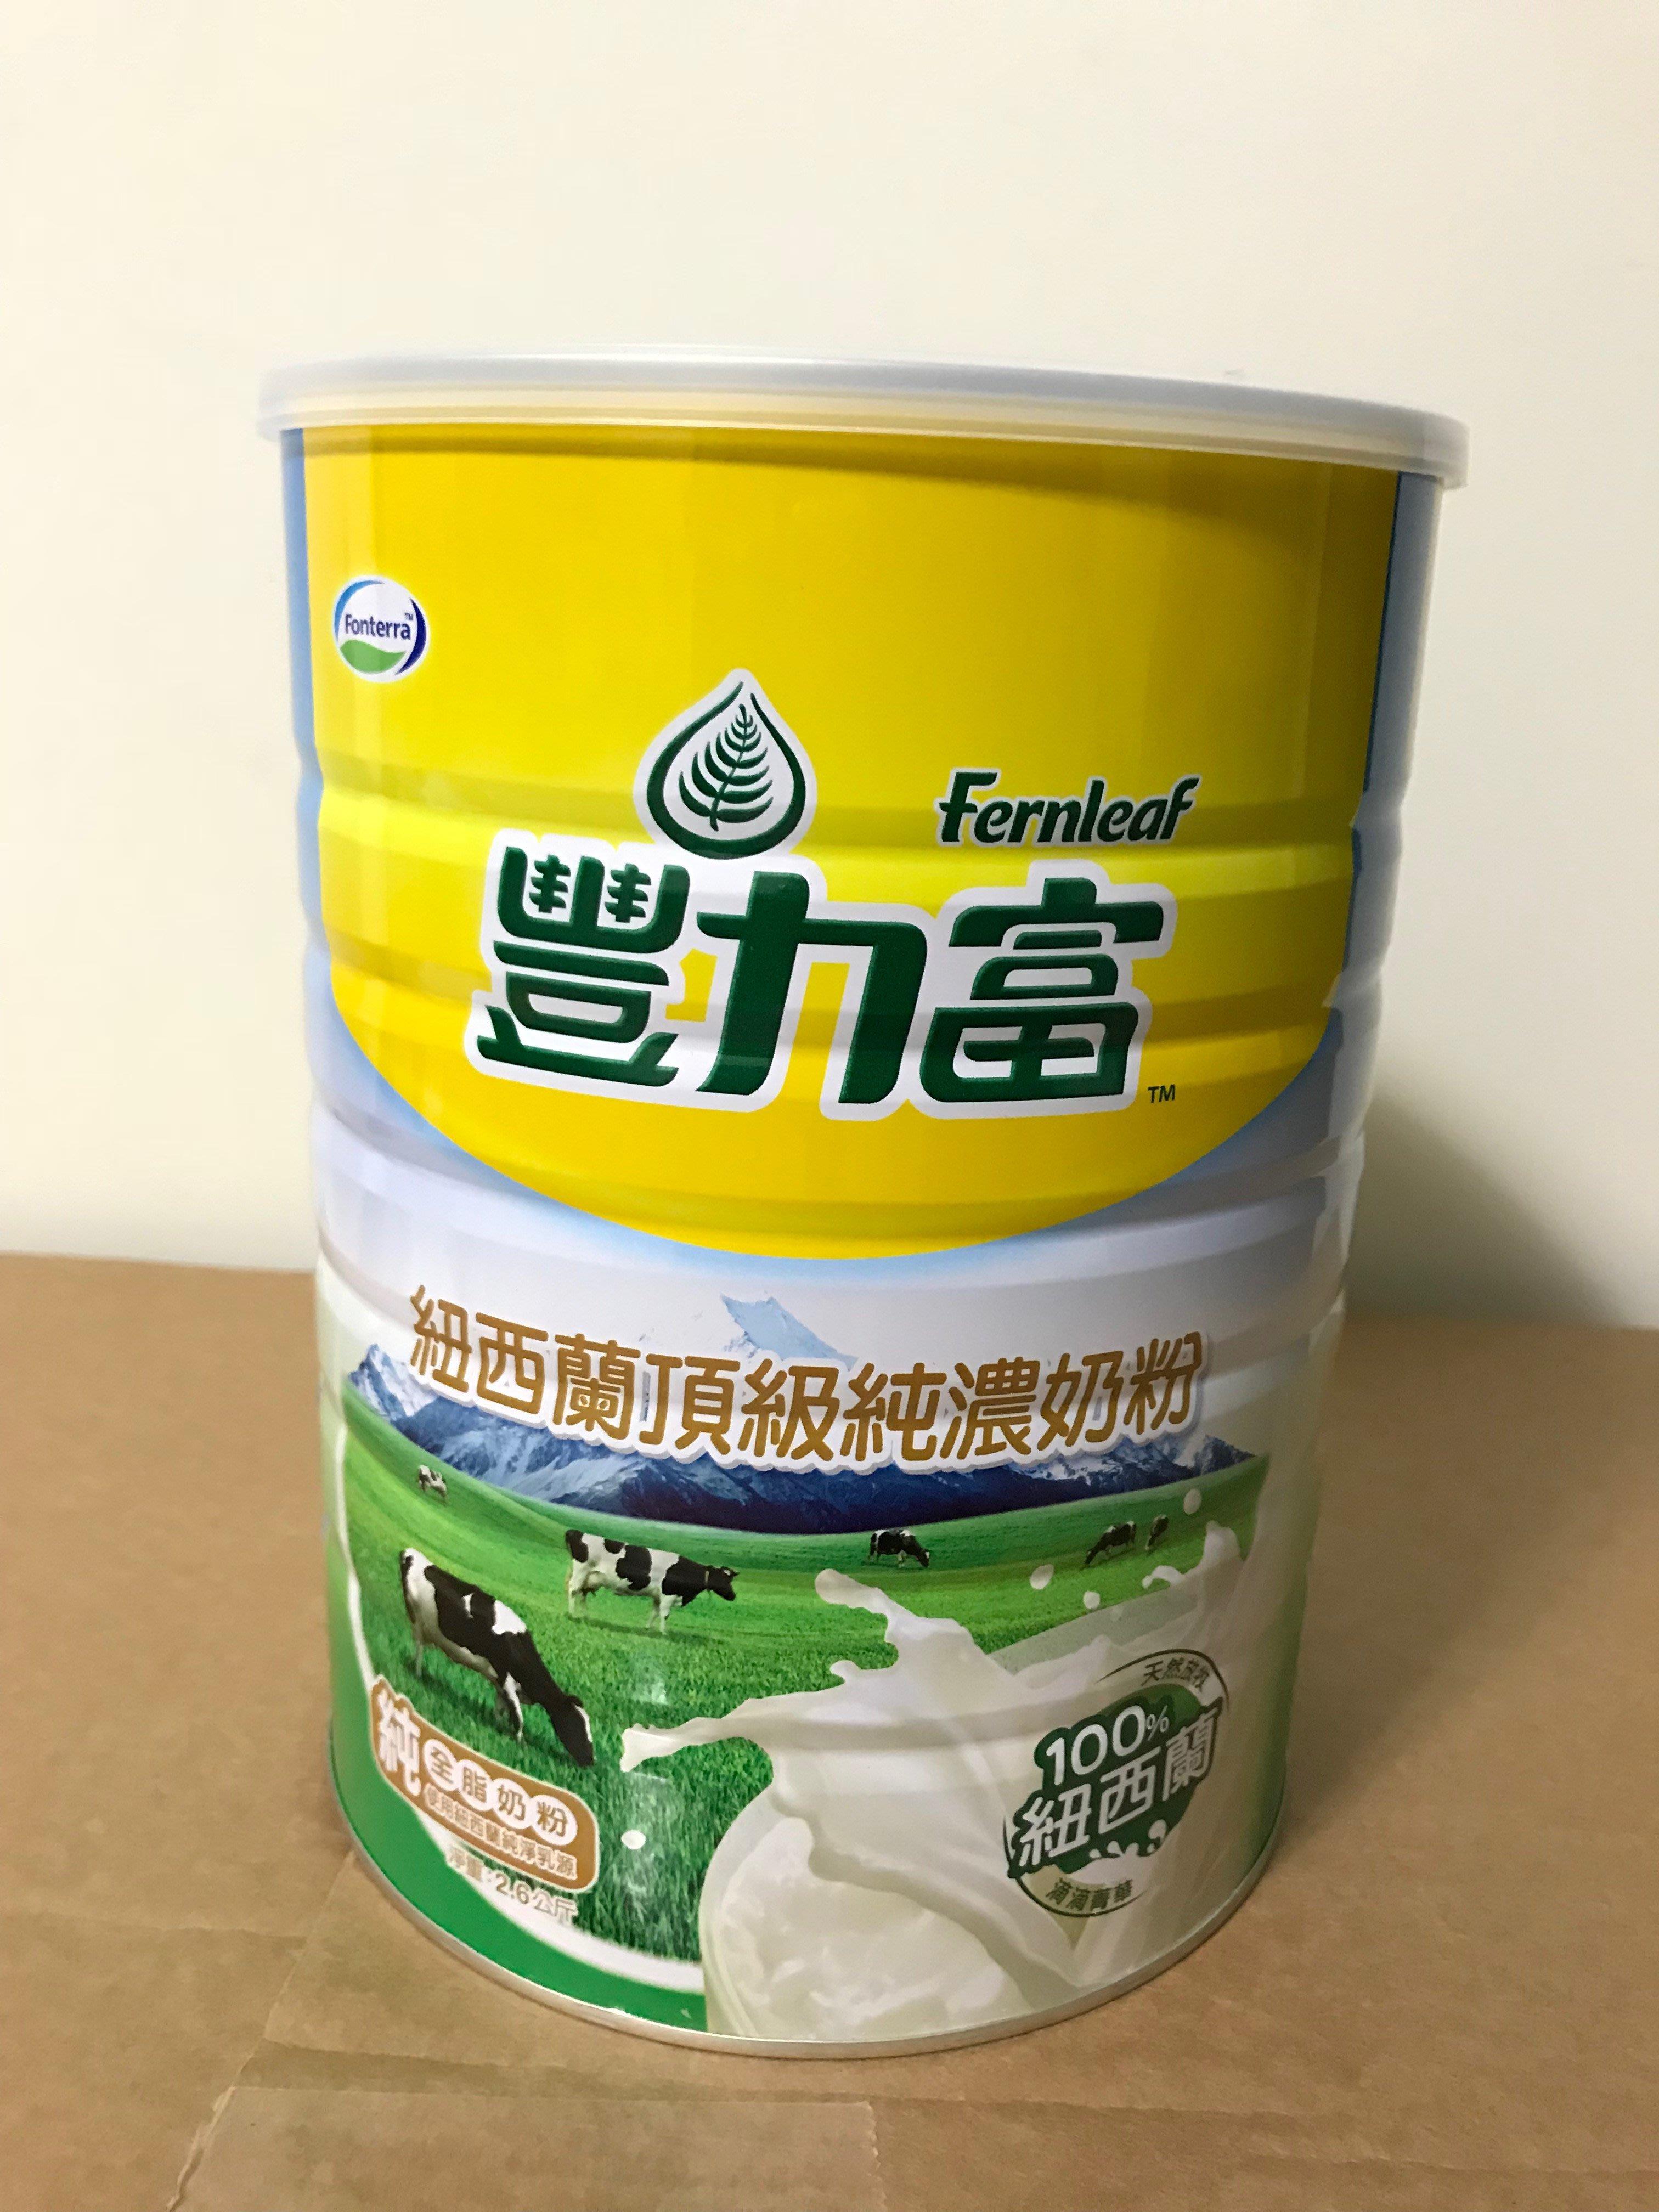 Costco好市多 Fernleaf豐力富紐西蘭頂級純濃奶粉 2.6kg